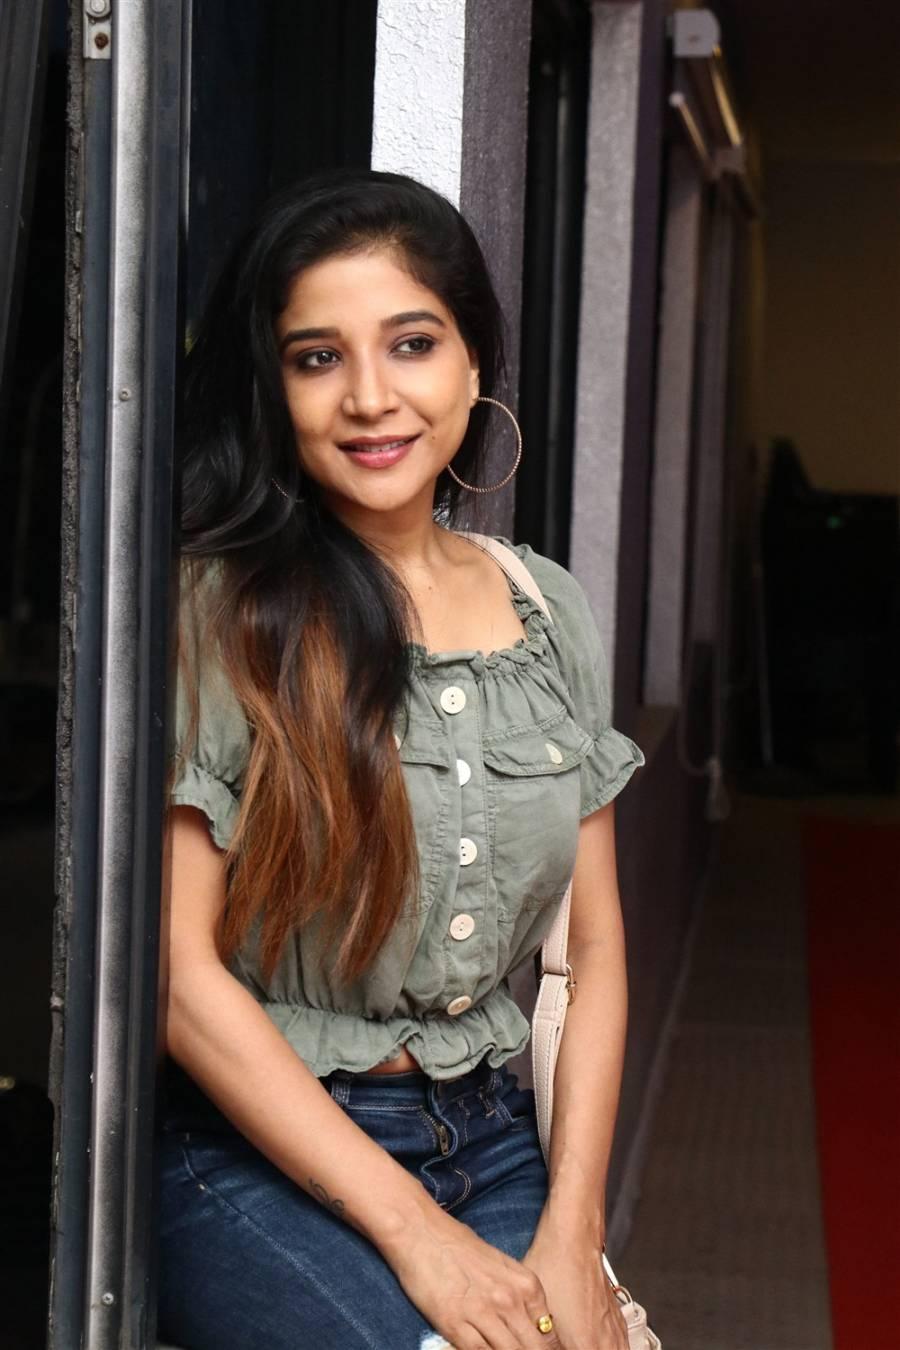 Beautiful Indian Girl Sakshi Agarwal Without makeup Face